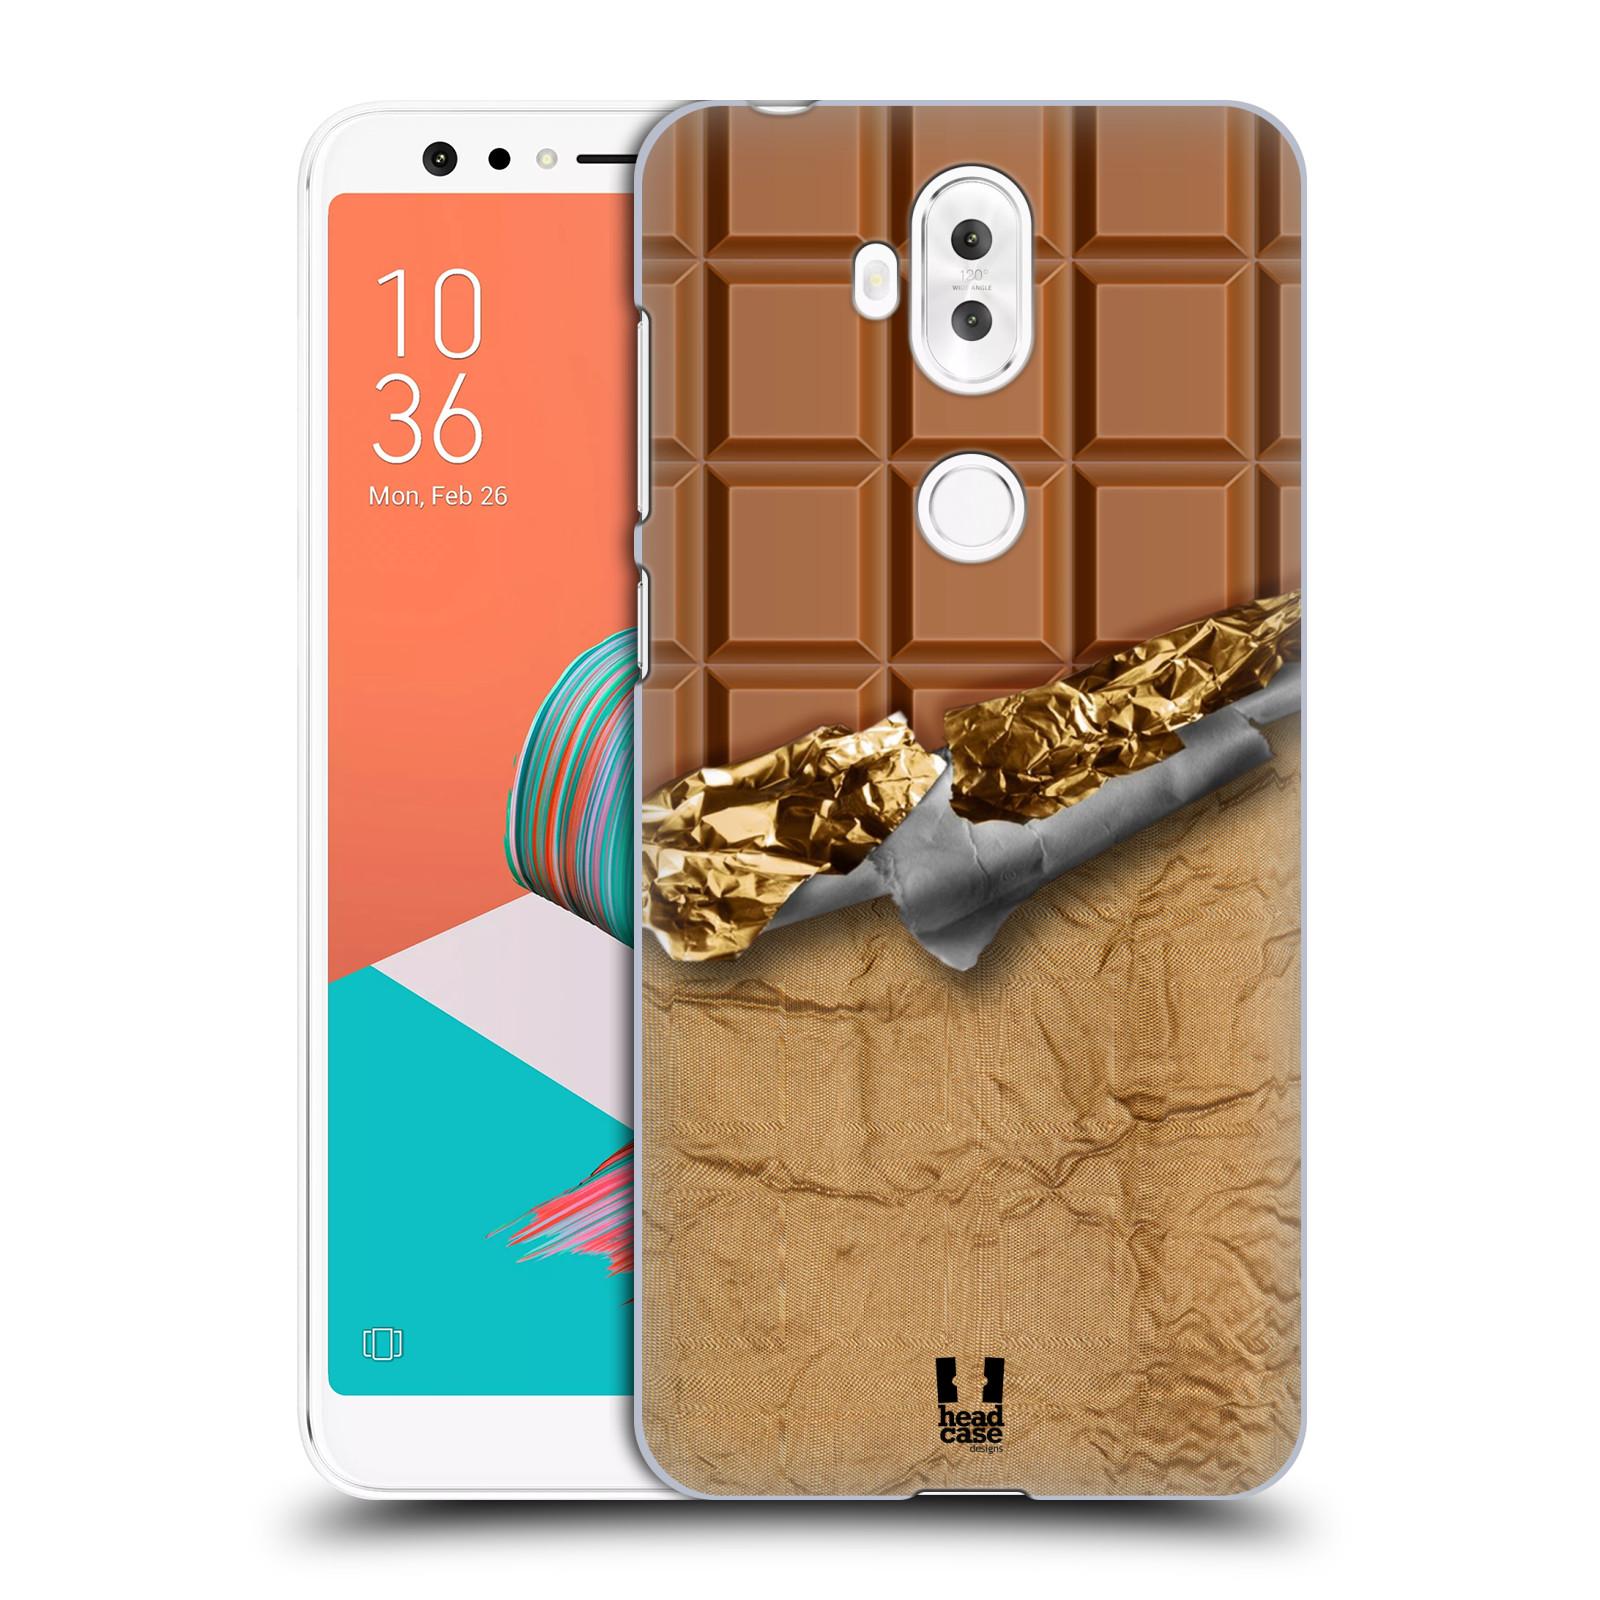 Plastové pouzdro na mobil Asus ZenFone 5 Lite ZC600KL - Head Case - ČOKOFOILED (Plastový kryt či obal na mobilní telefon Asus ZenFone 5 Lite (ZC600KL) s motivem ČOKOFOILED)